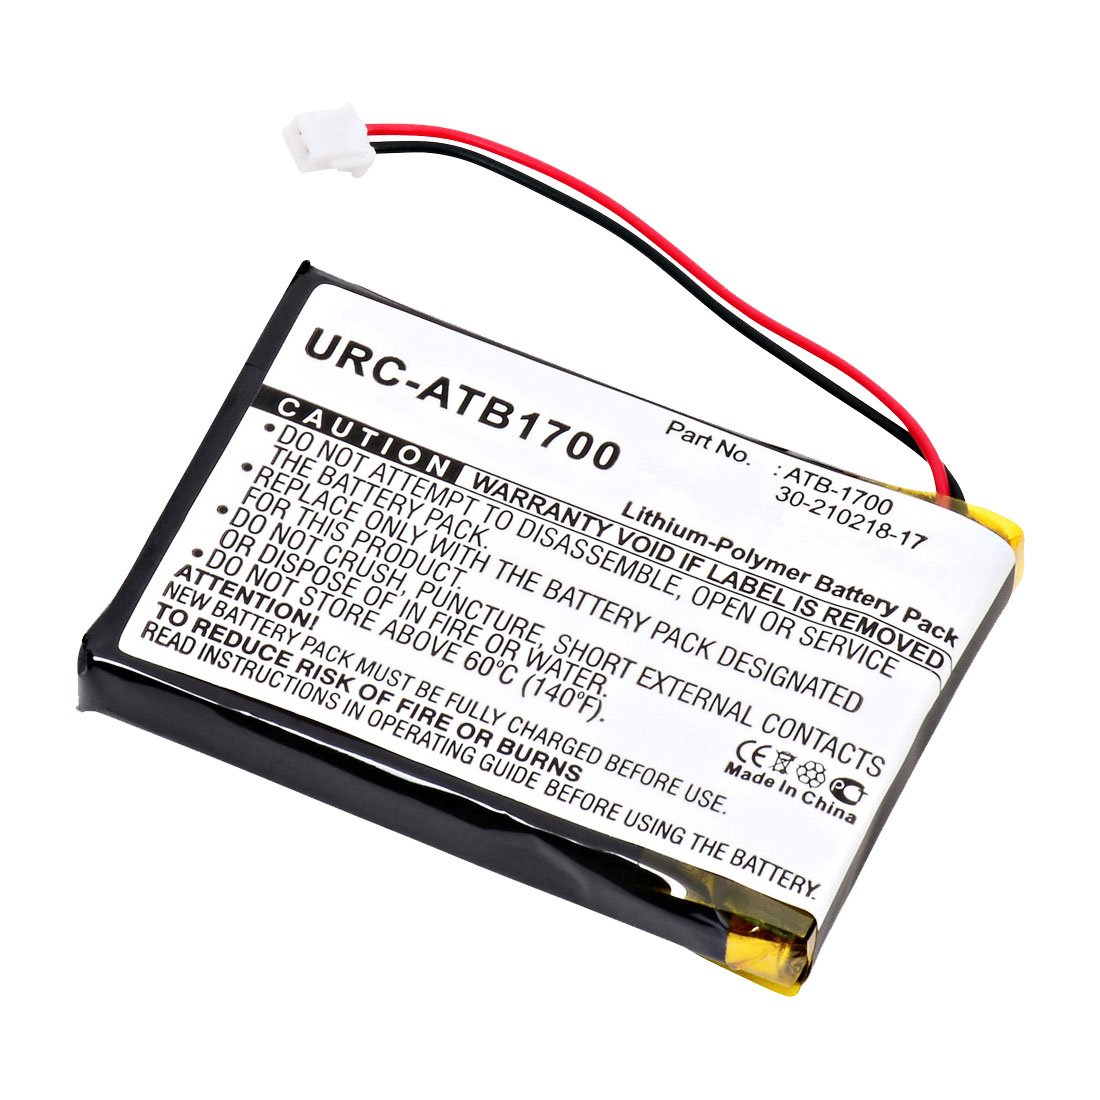 Replacement Rti Atb Battery Batterymart